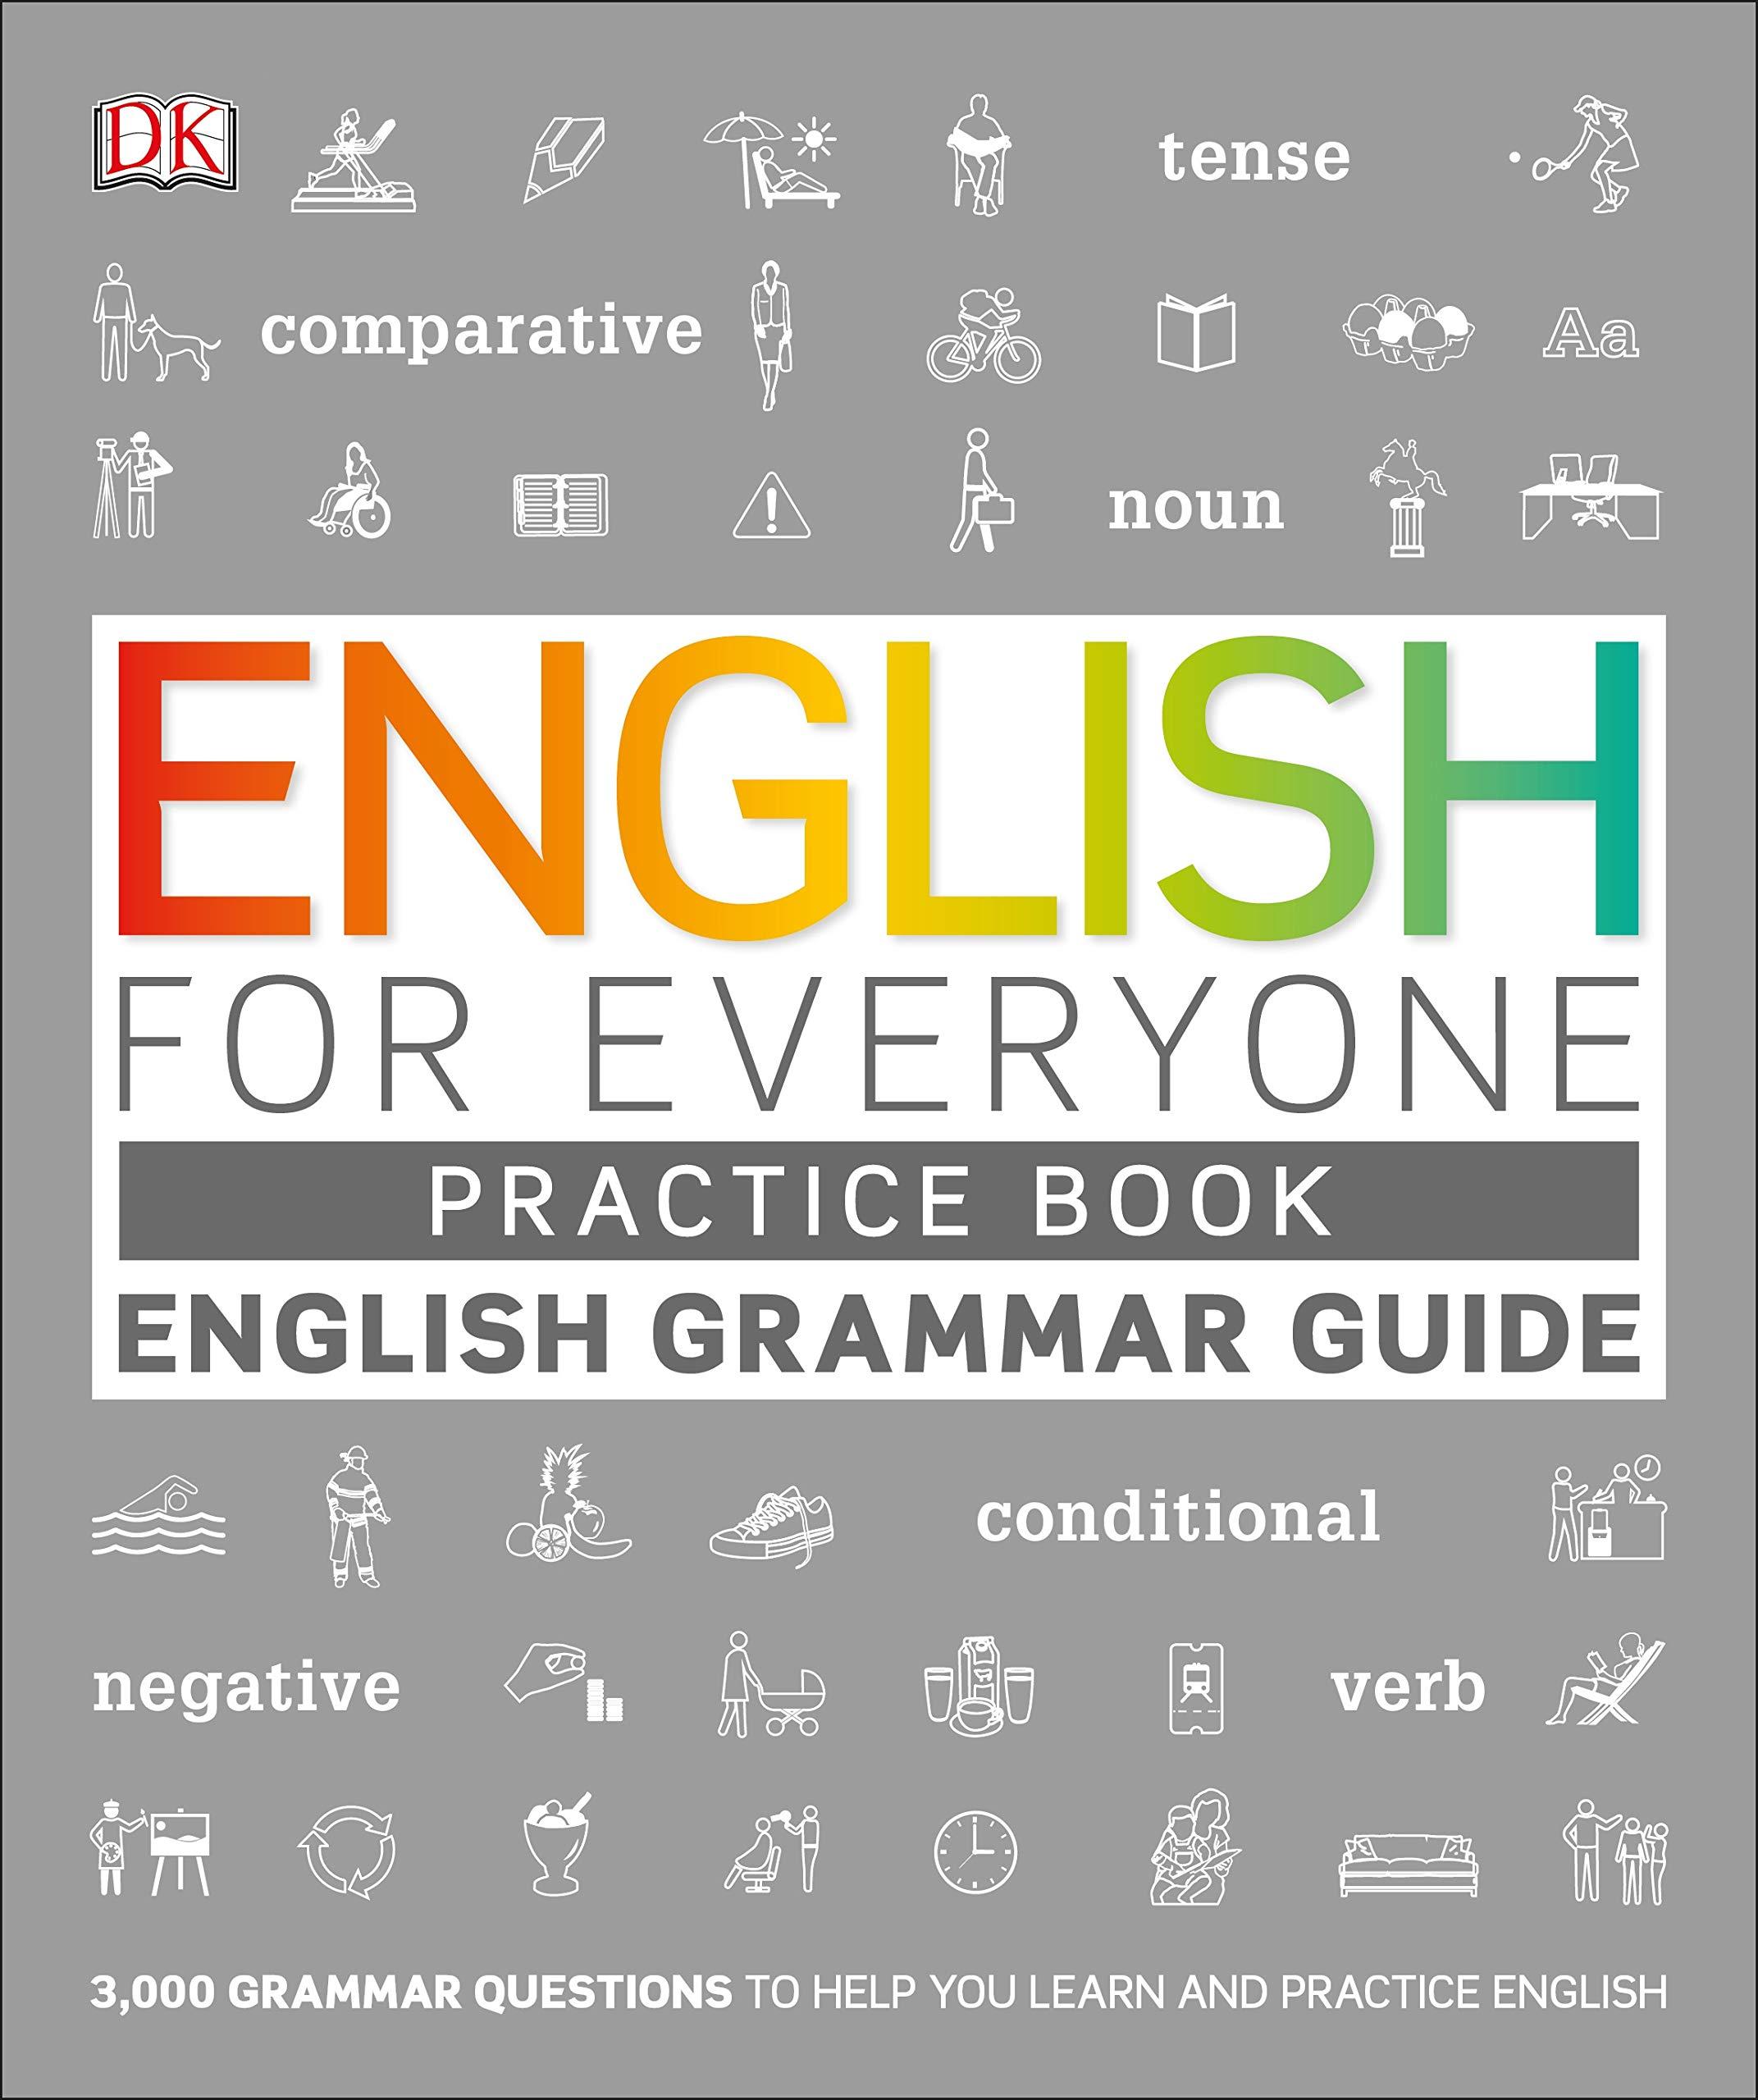 English for Everyone Grammar Guide Practice Book: DK